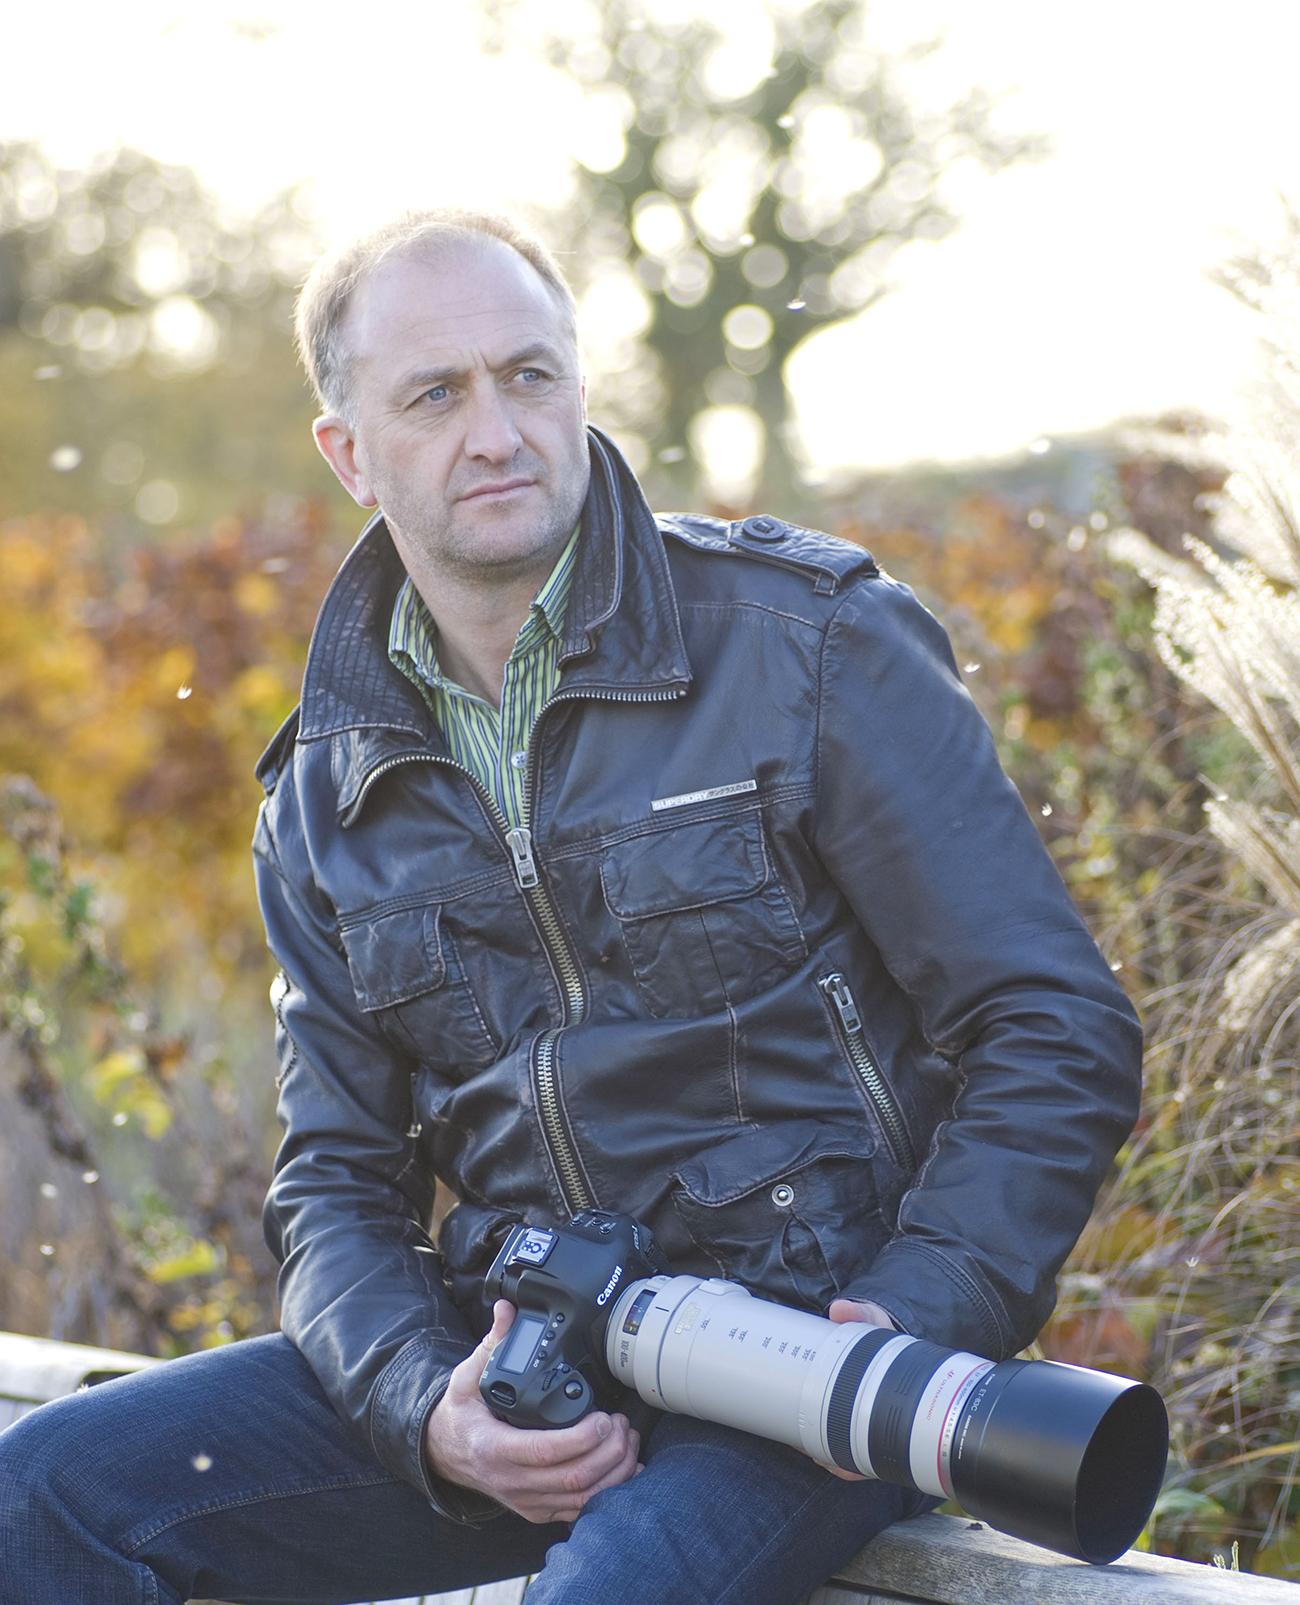 Clive-Nichols-Photographer-Gardening-BB.jpg